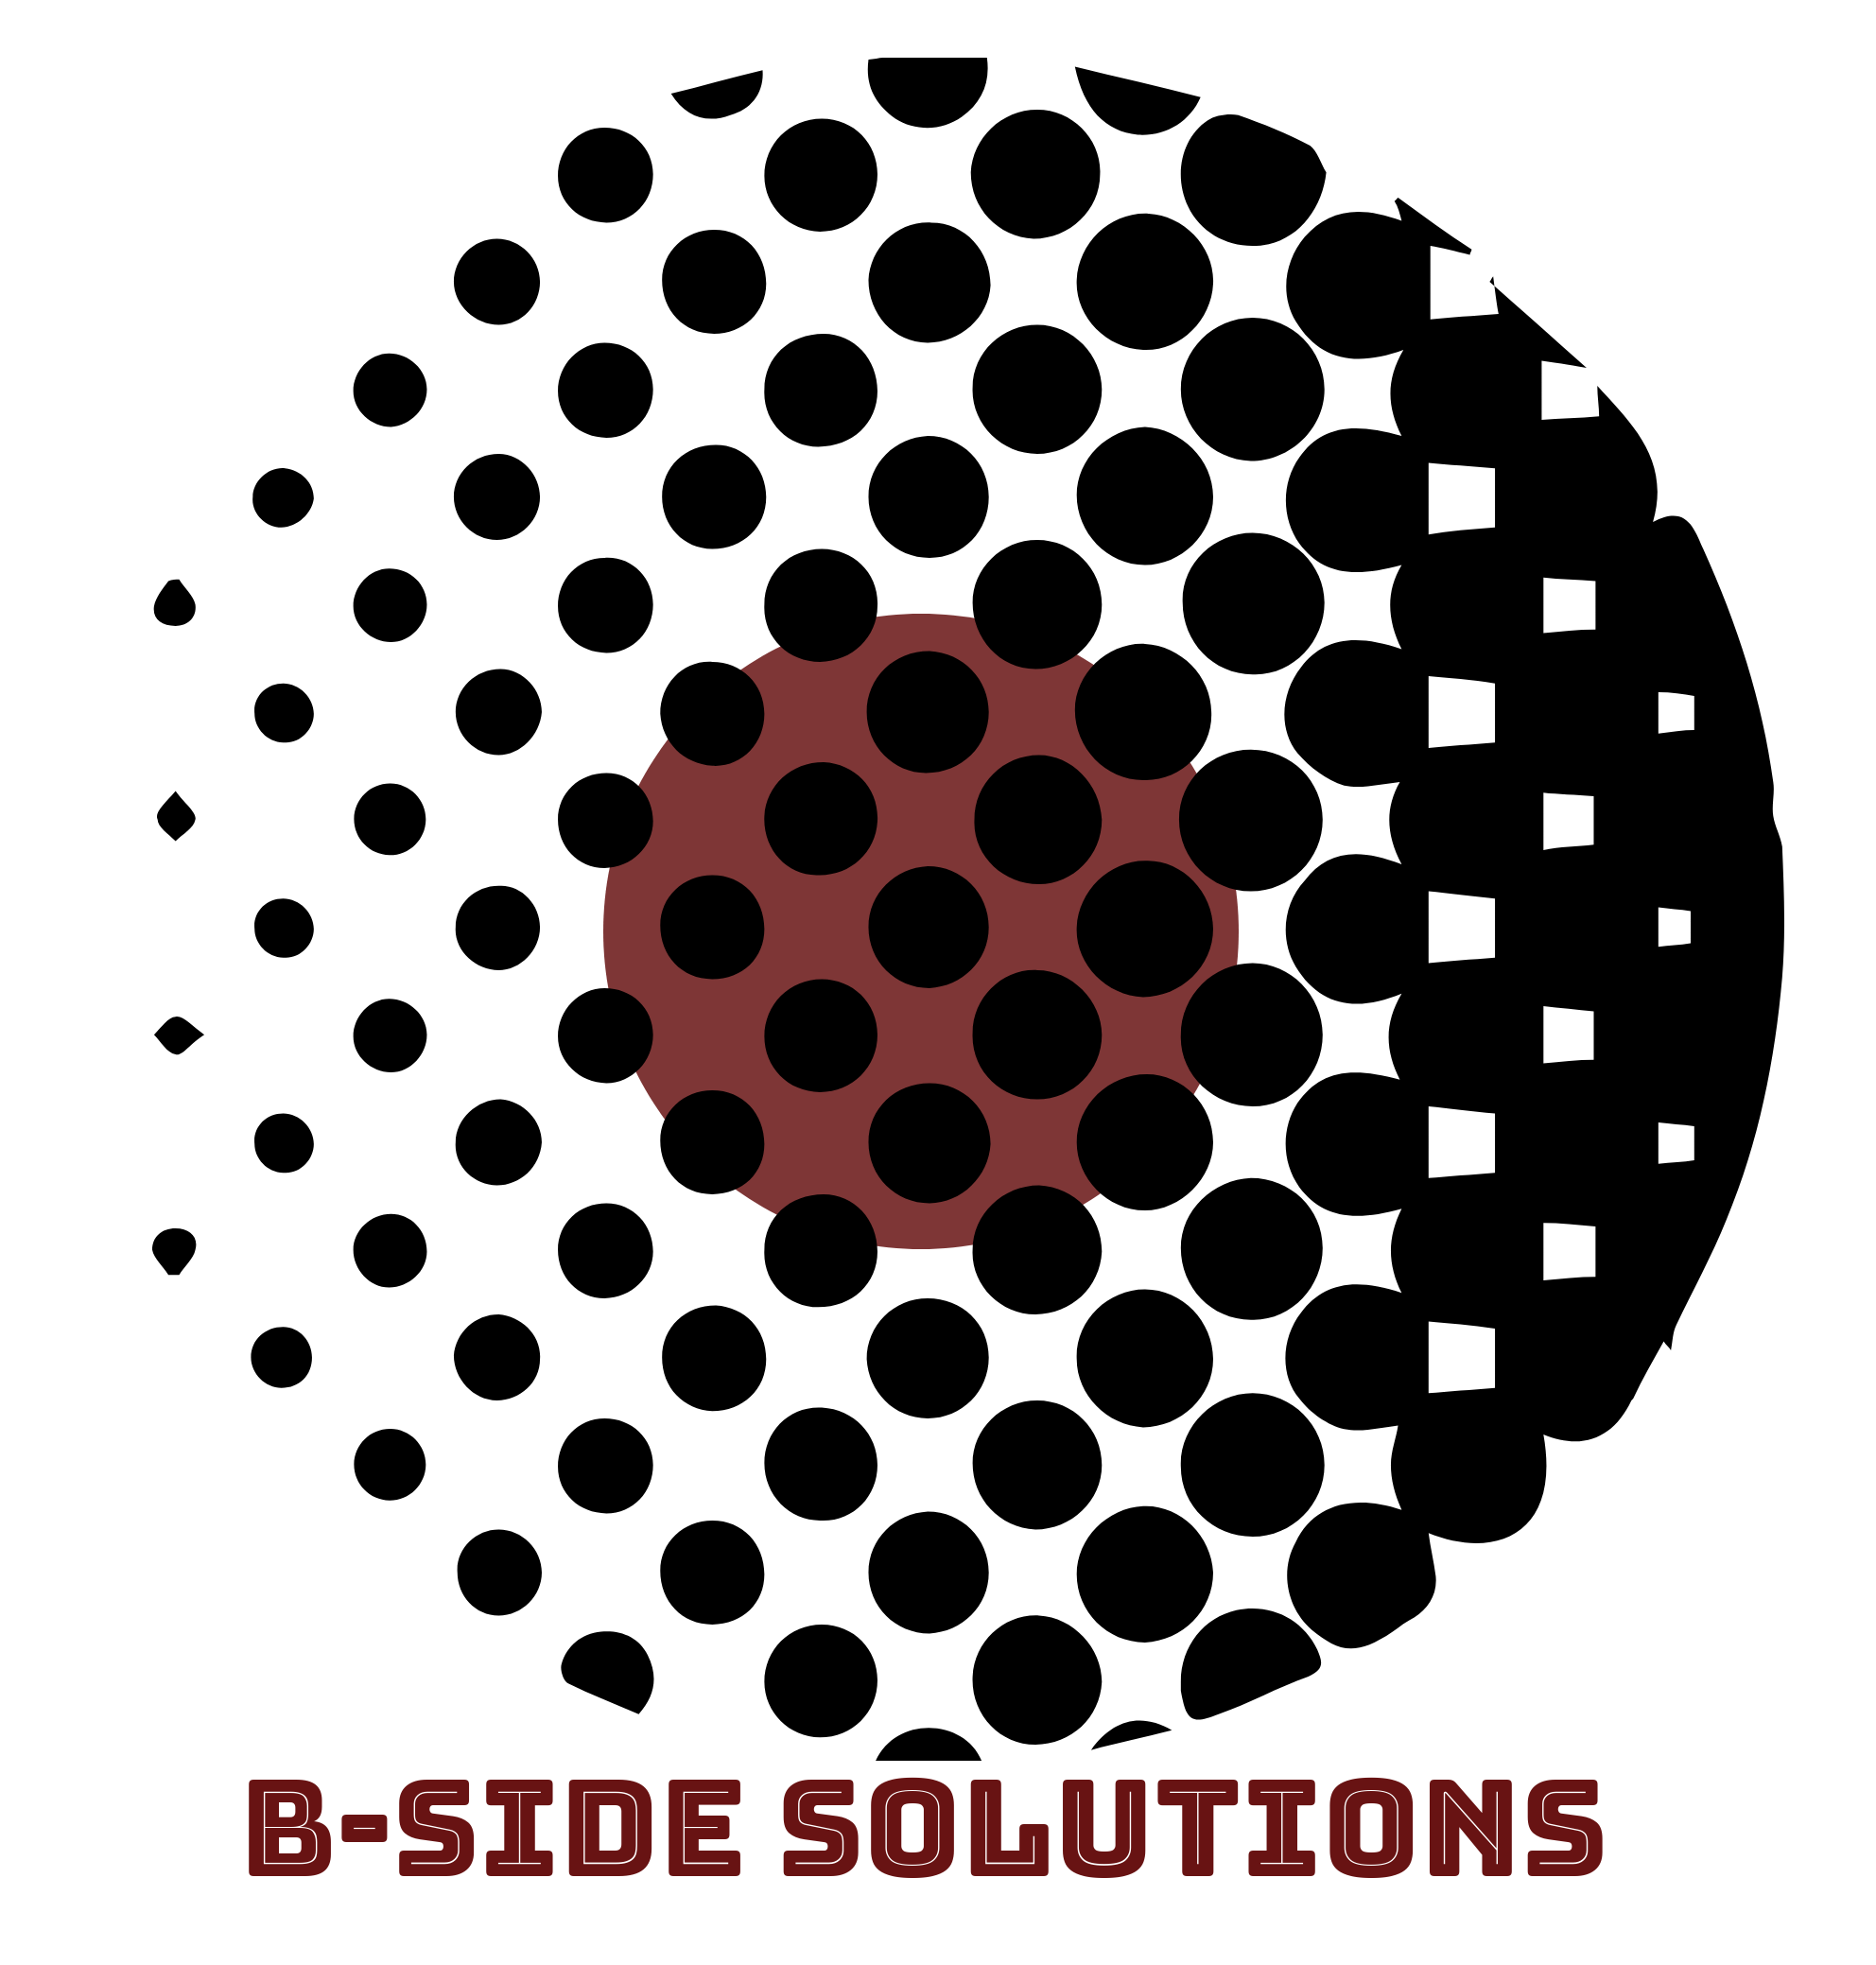 BSide Solutions LLC